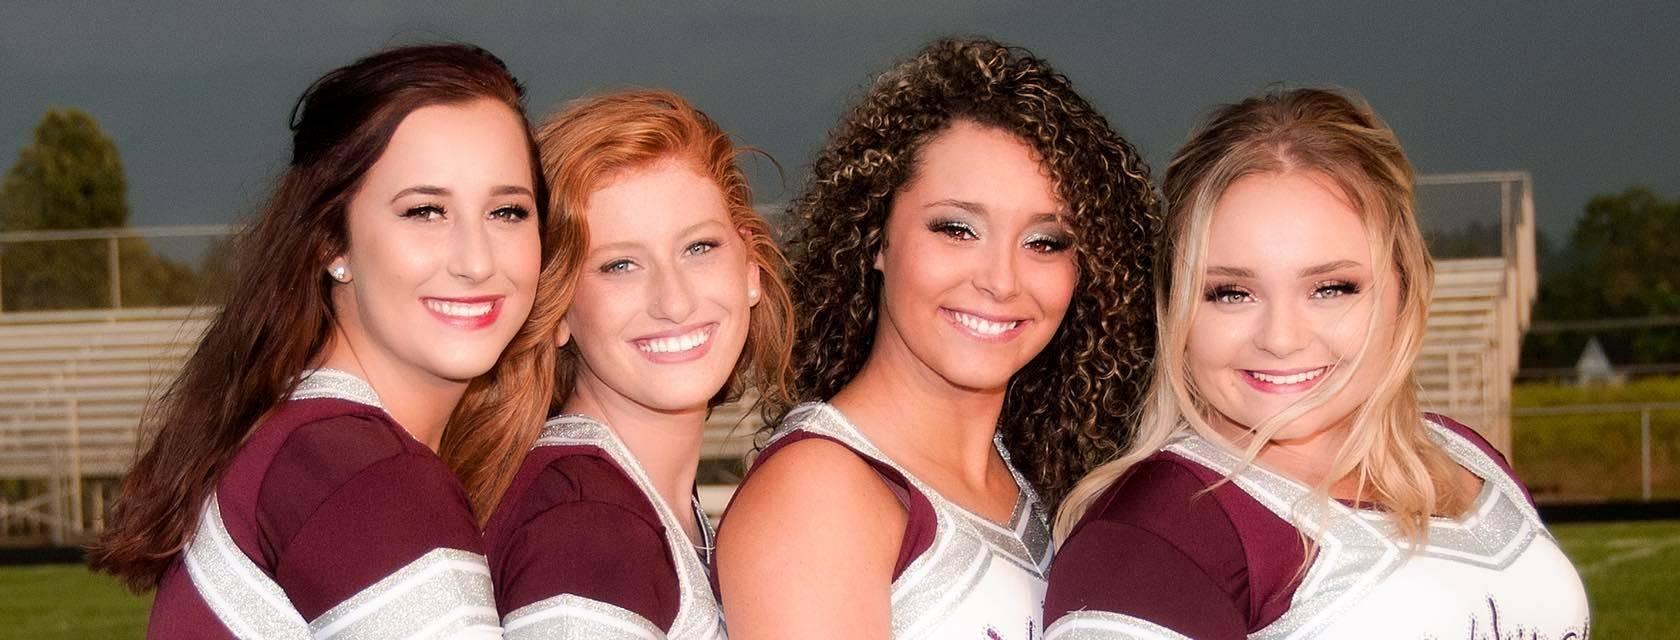 Class of 2019 Senior Cheerleaders